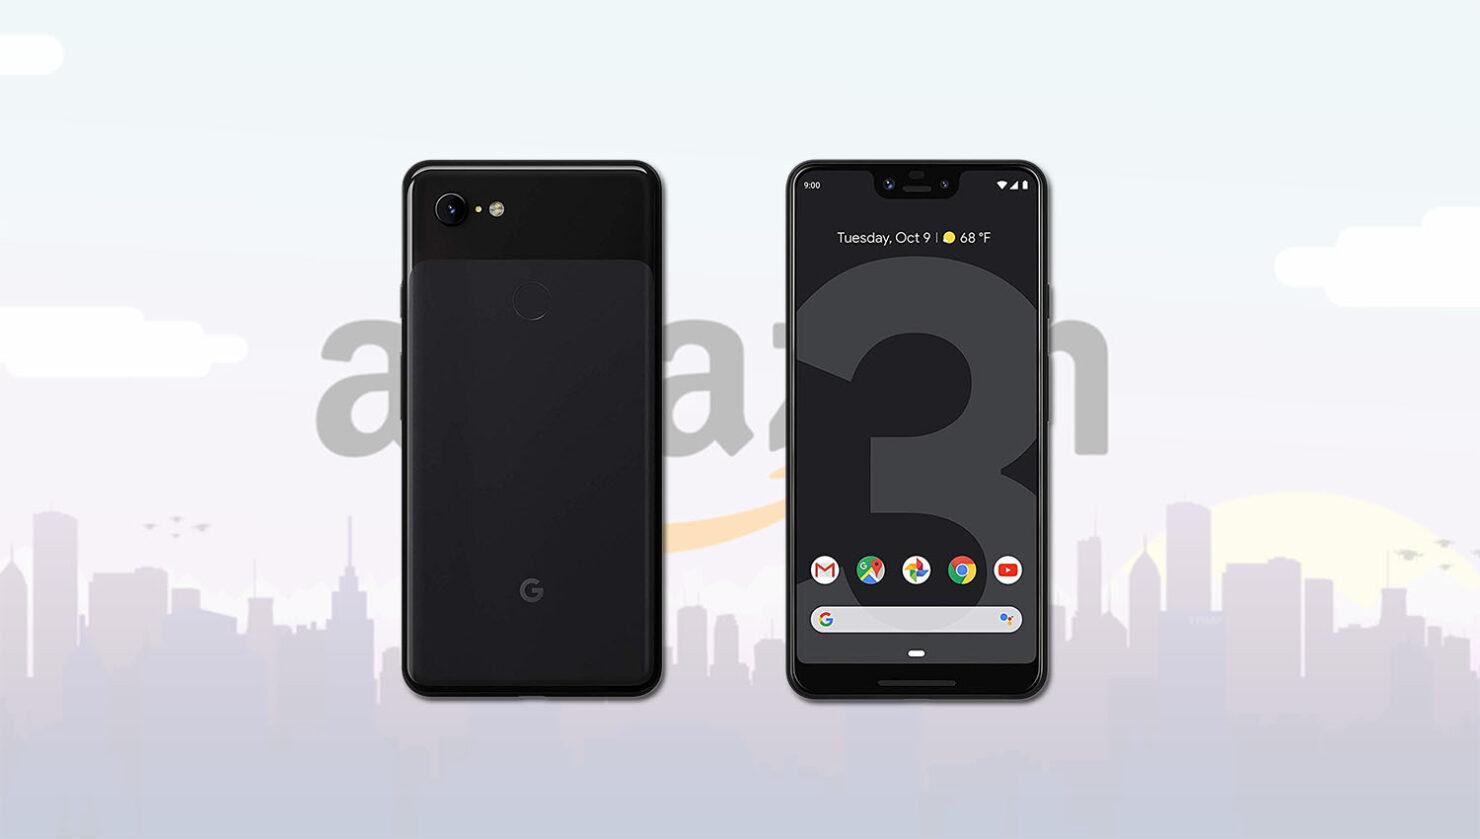 Google's Pixel 3 XL Receives a Deeper Price Cut Before Pixel 4 Event